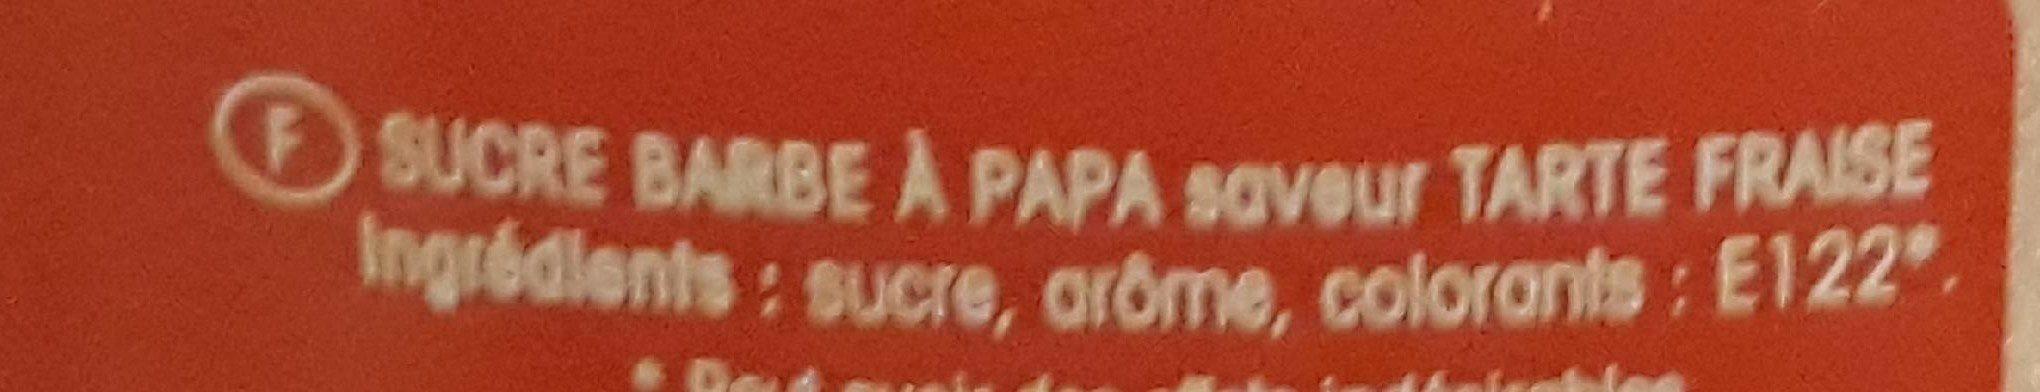 Barbe a papa - Ingrédients - fr